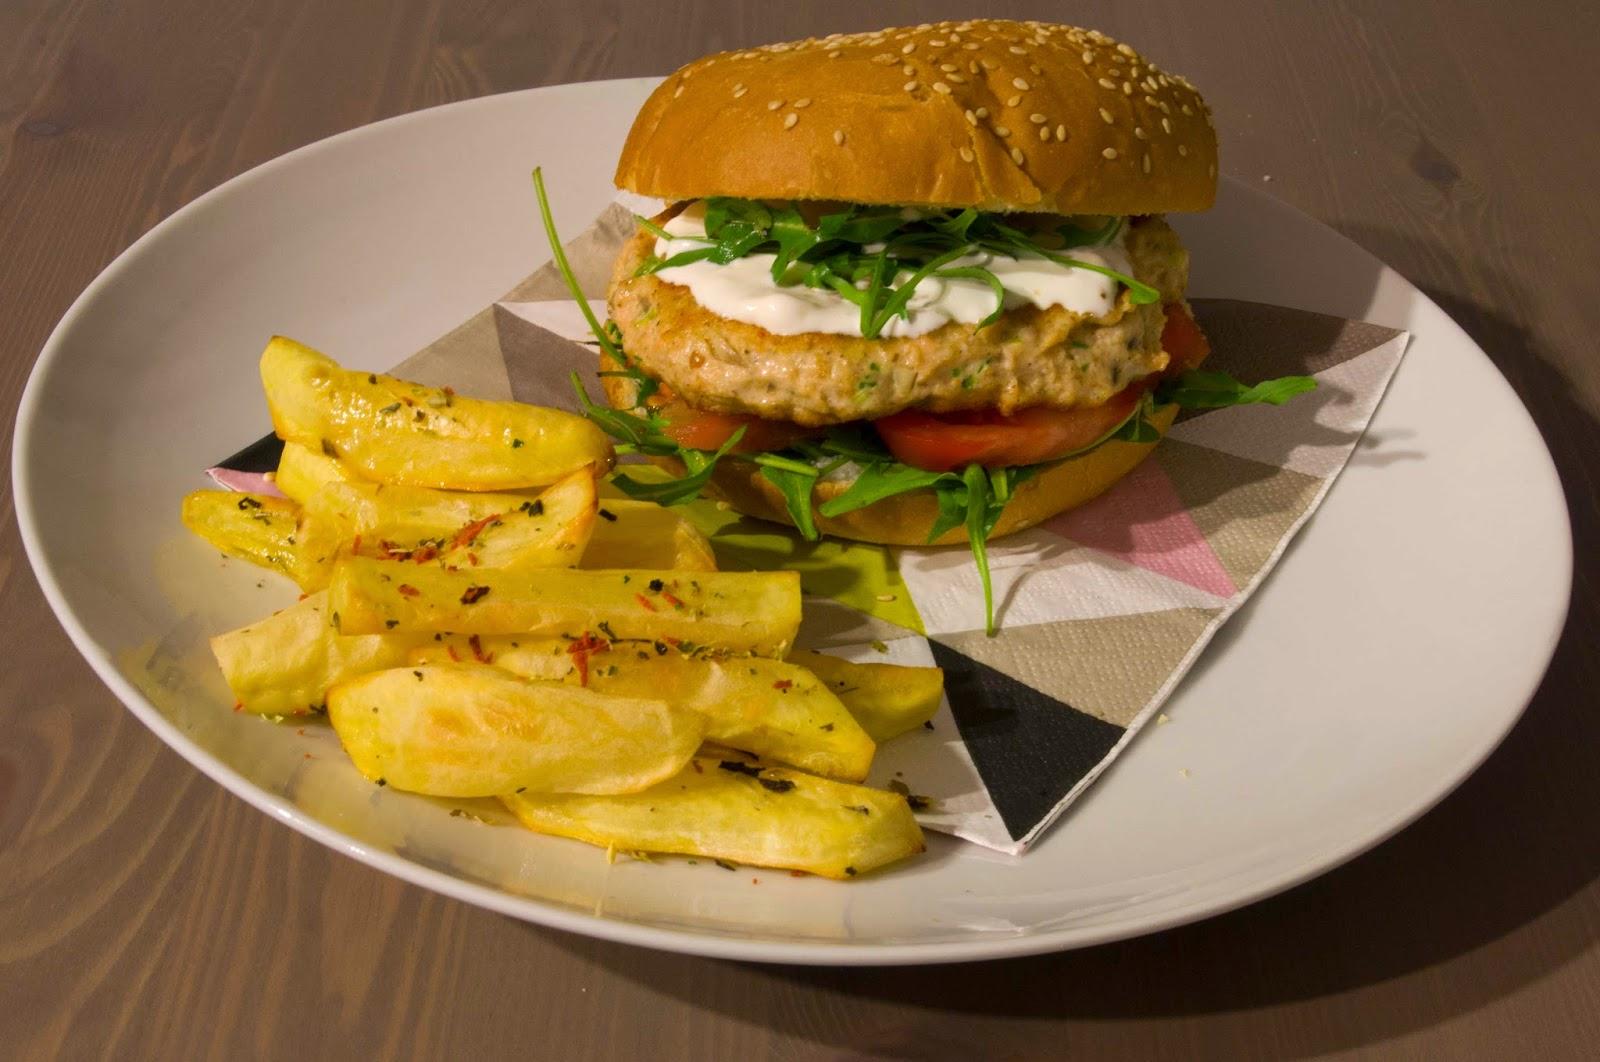 http://mojemenu.blogspot.com/2015/02/domowy-fast-food-burgery-ososiowe-z.html